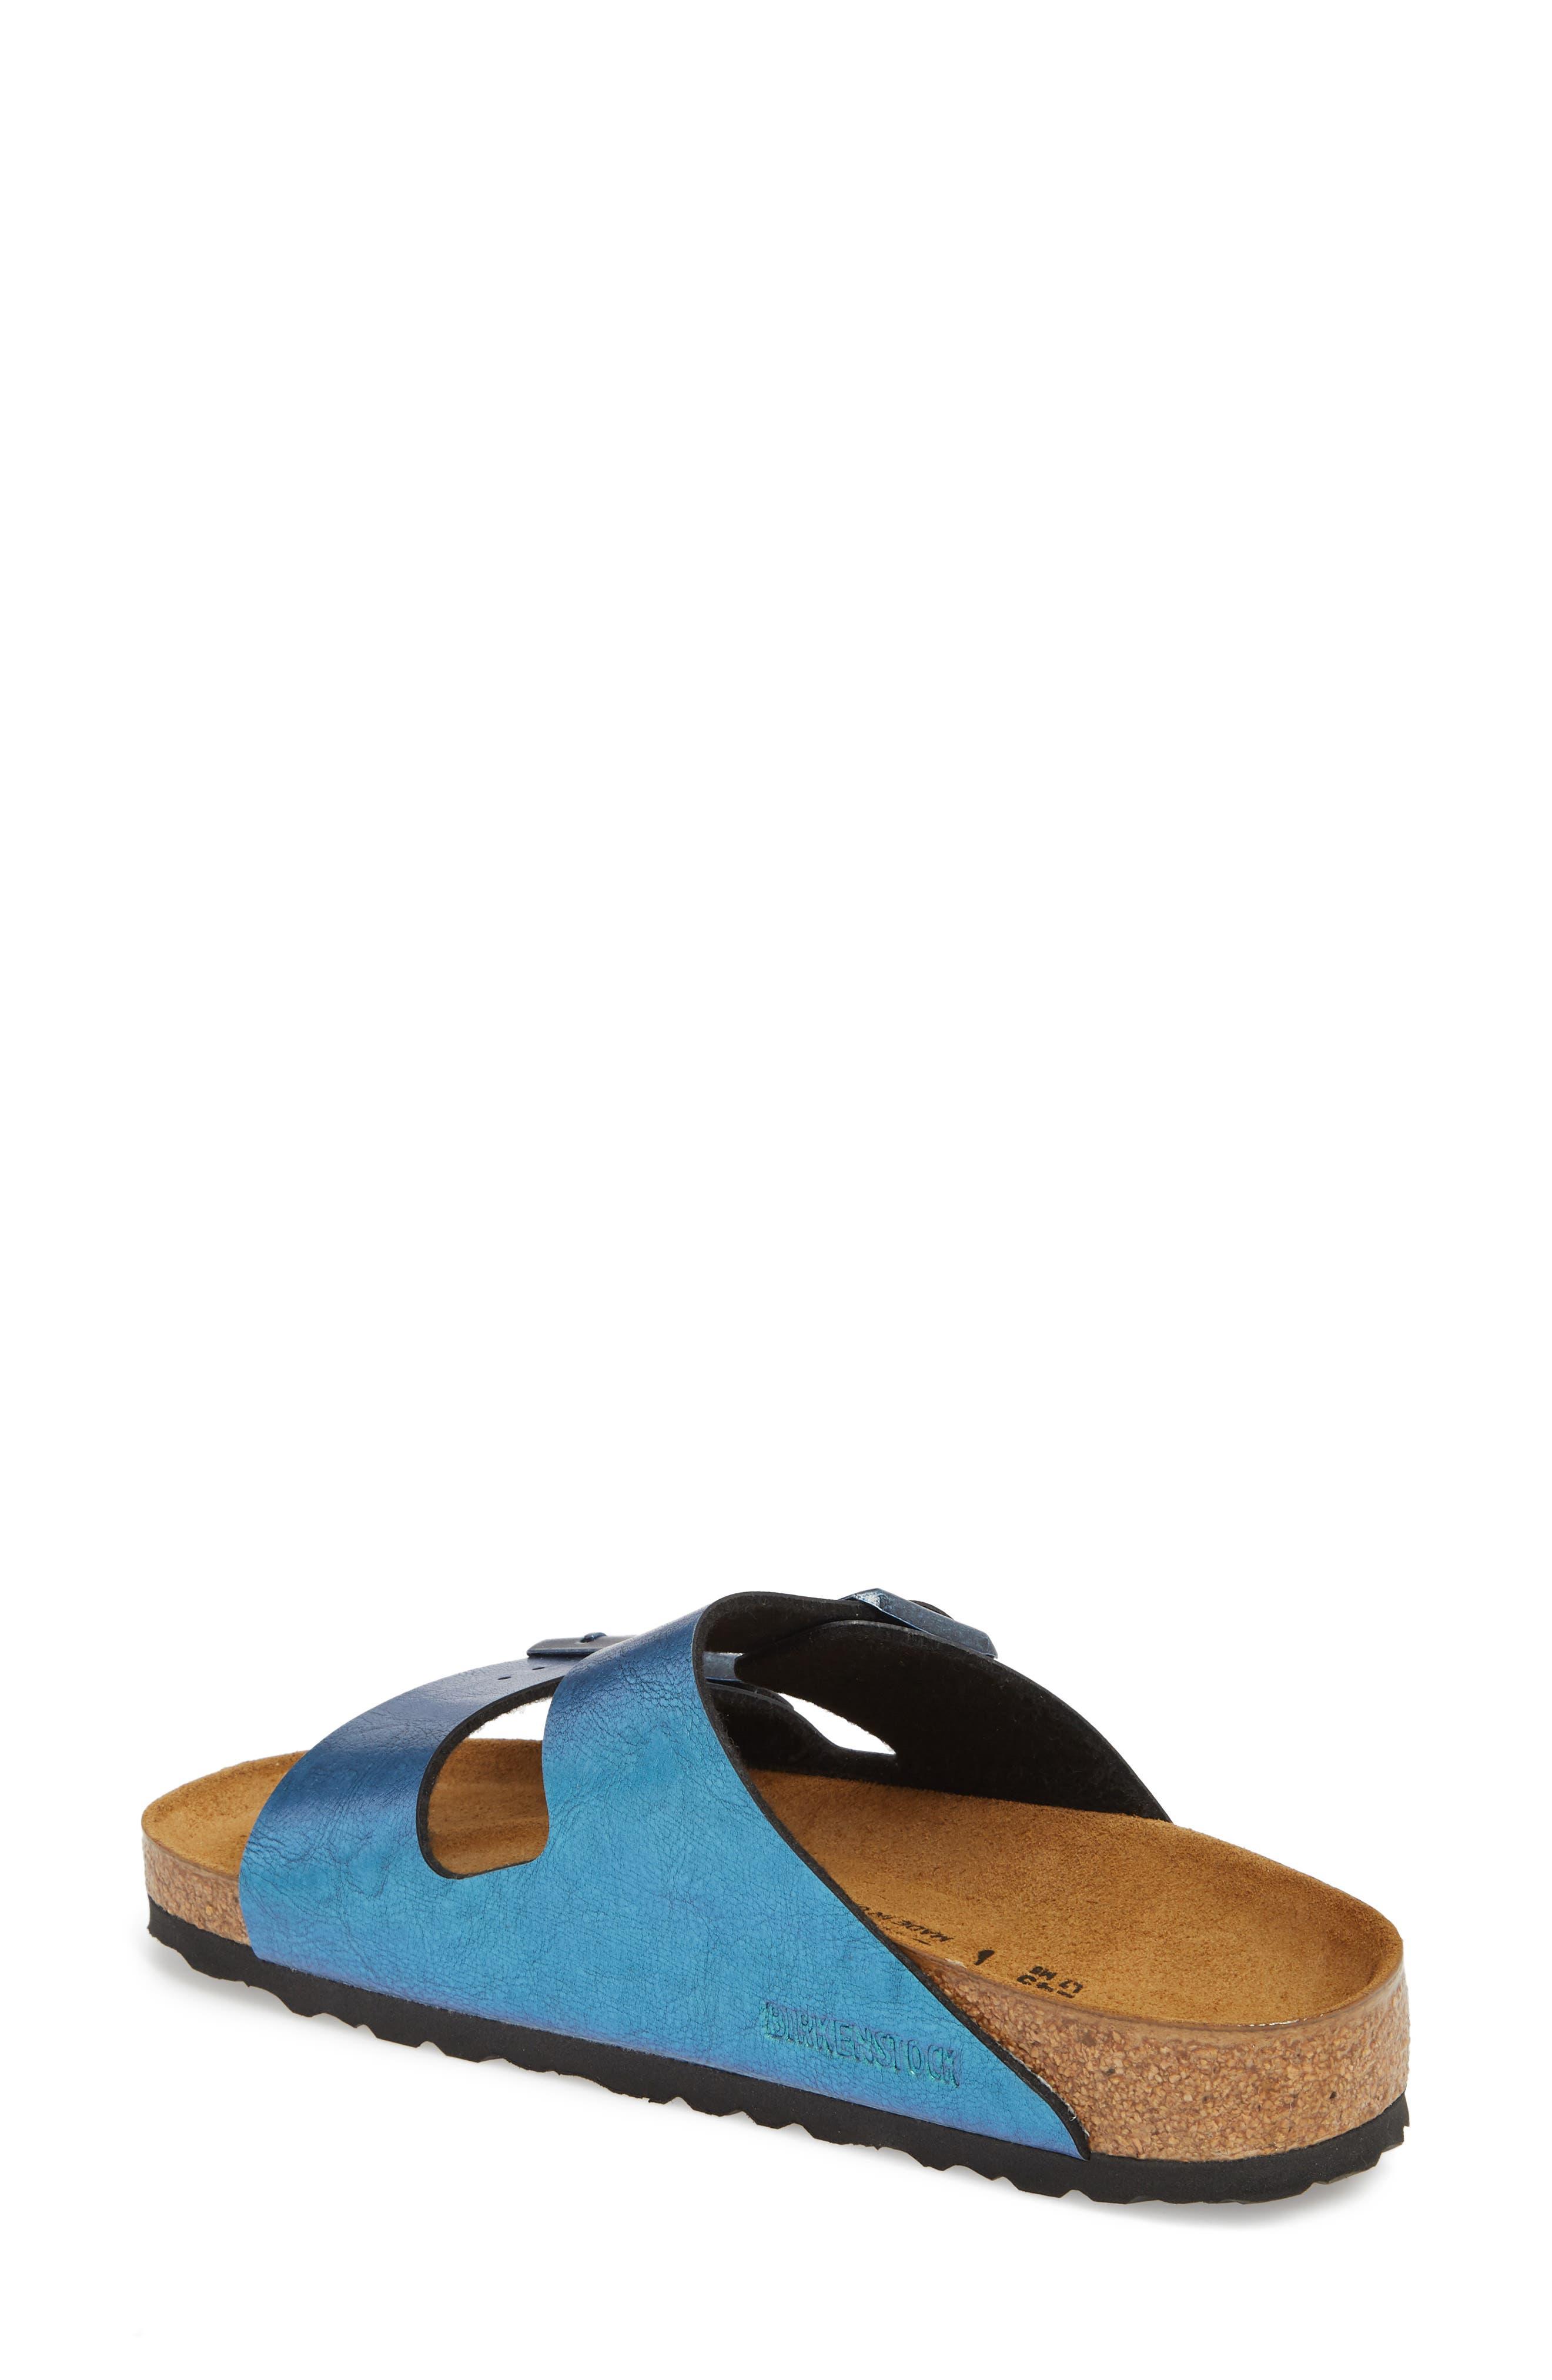 Arizona Graceful Birko-Flor<sup>™</sup> Sandal,                             Alternate thumbnail 2, color,                             Blue